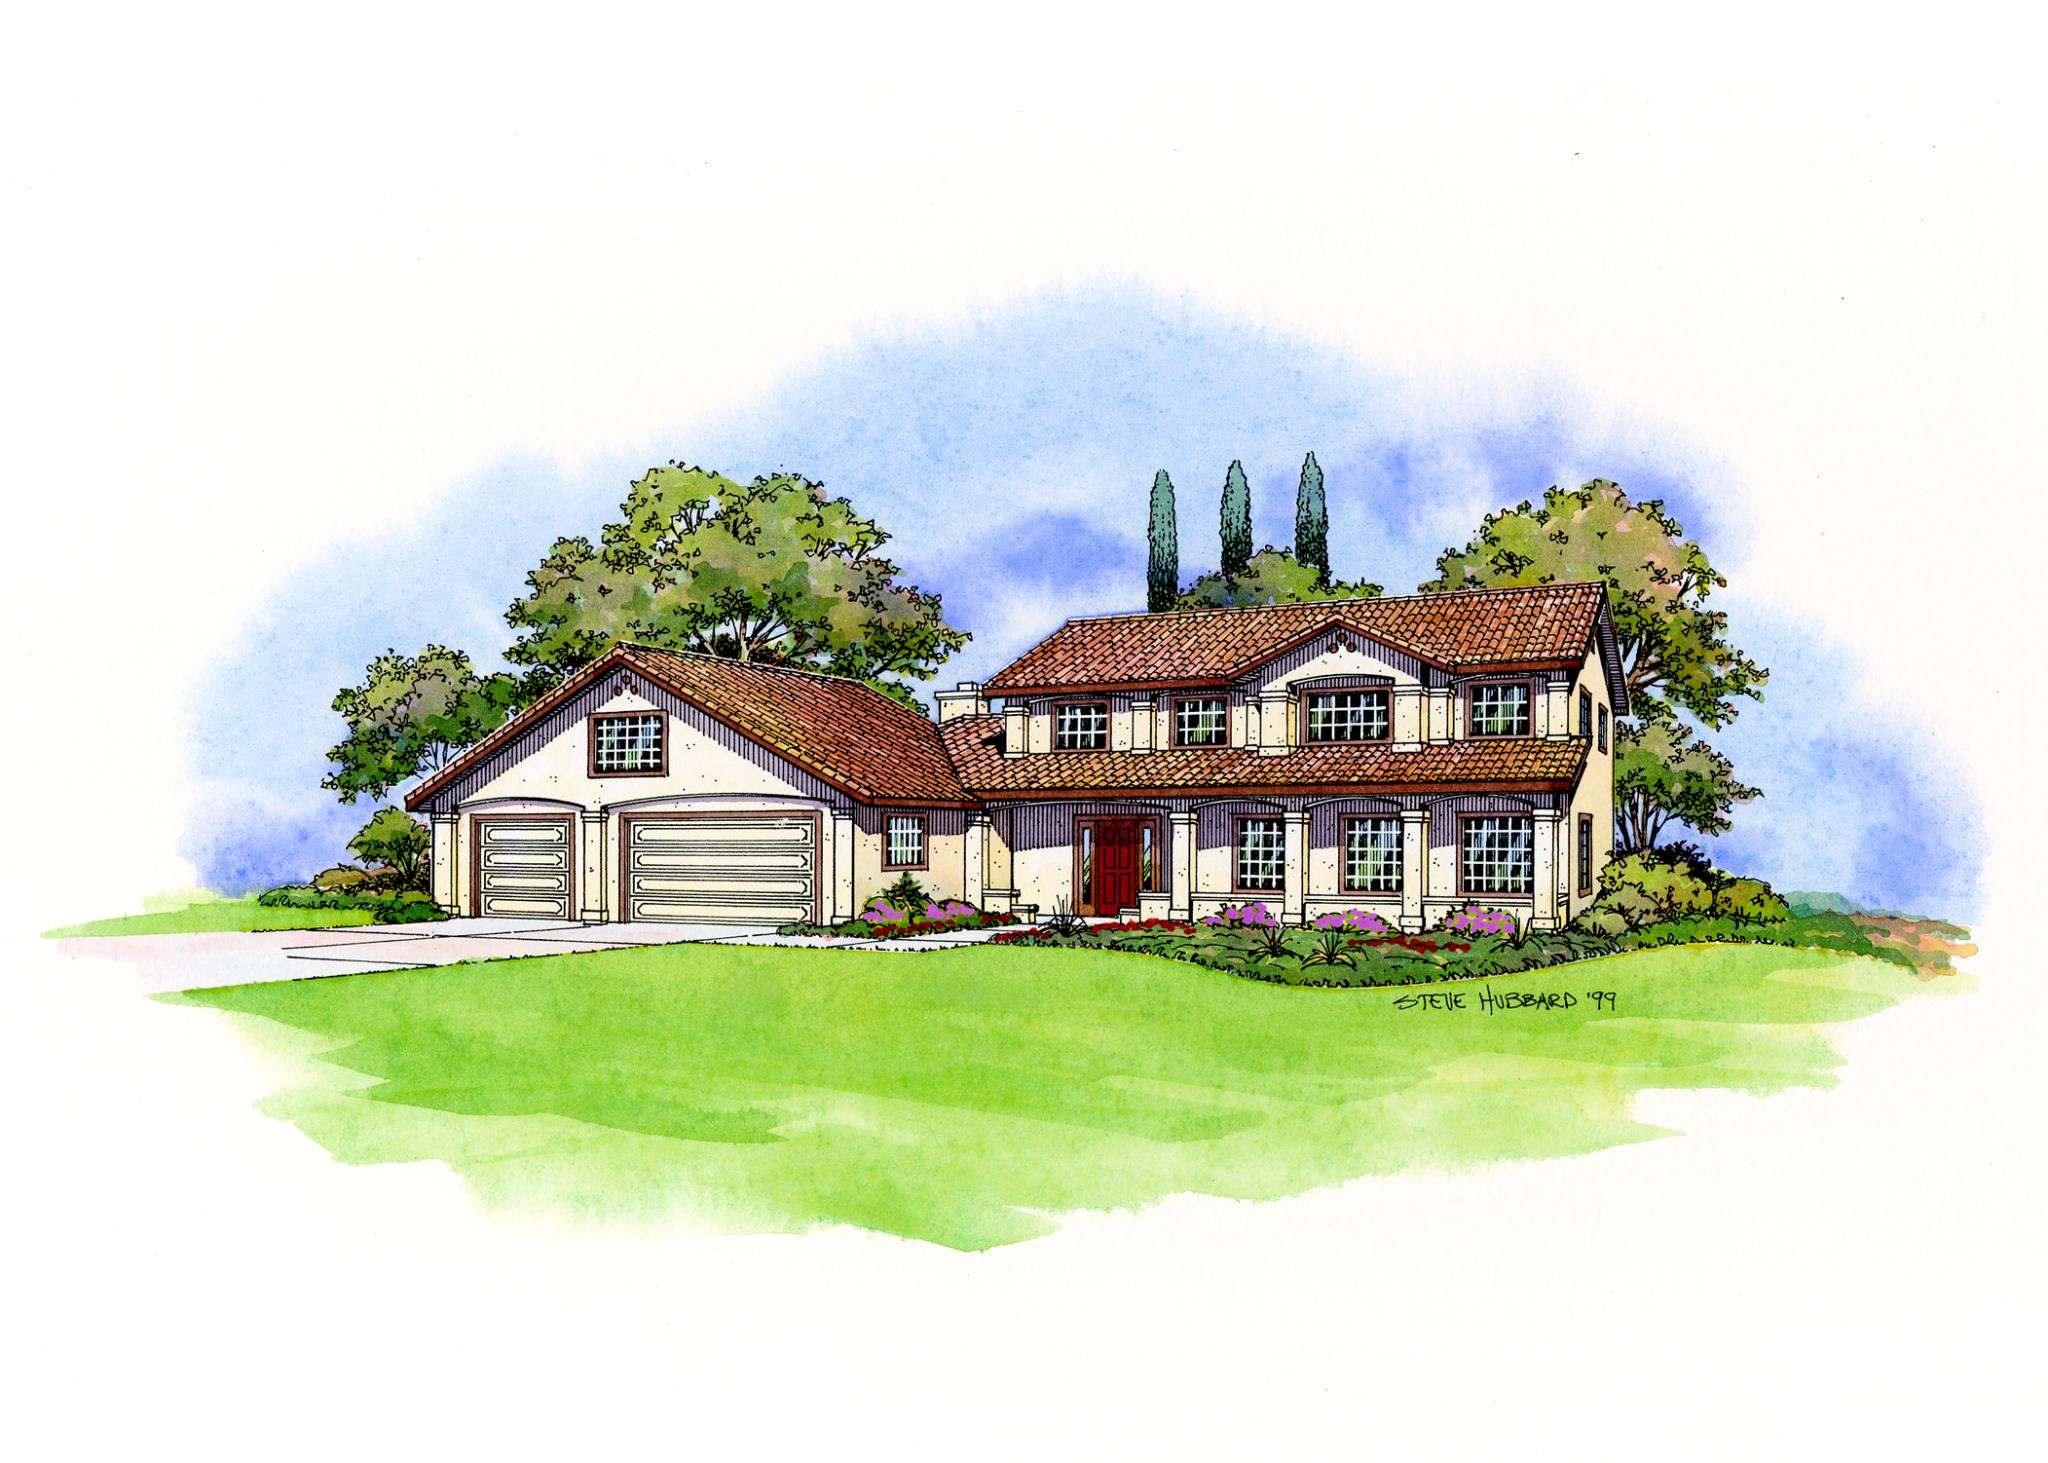 PMHI El Dorado home framing kit package, plans and price